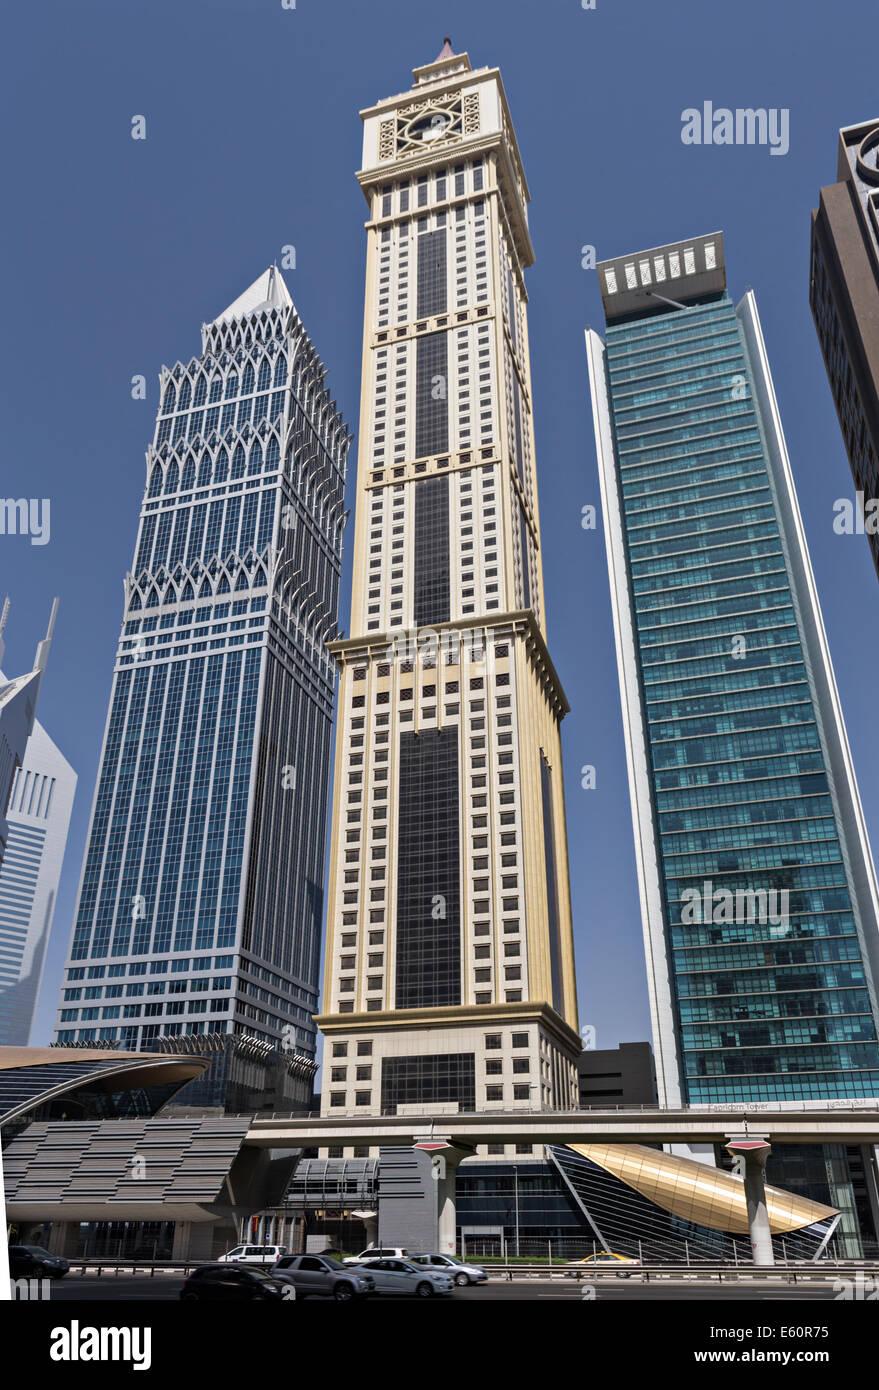 Al Yaqoub Tower - Stock Image